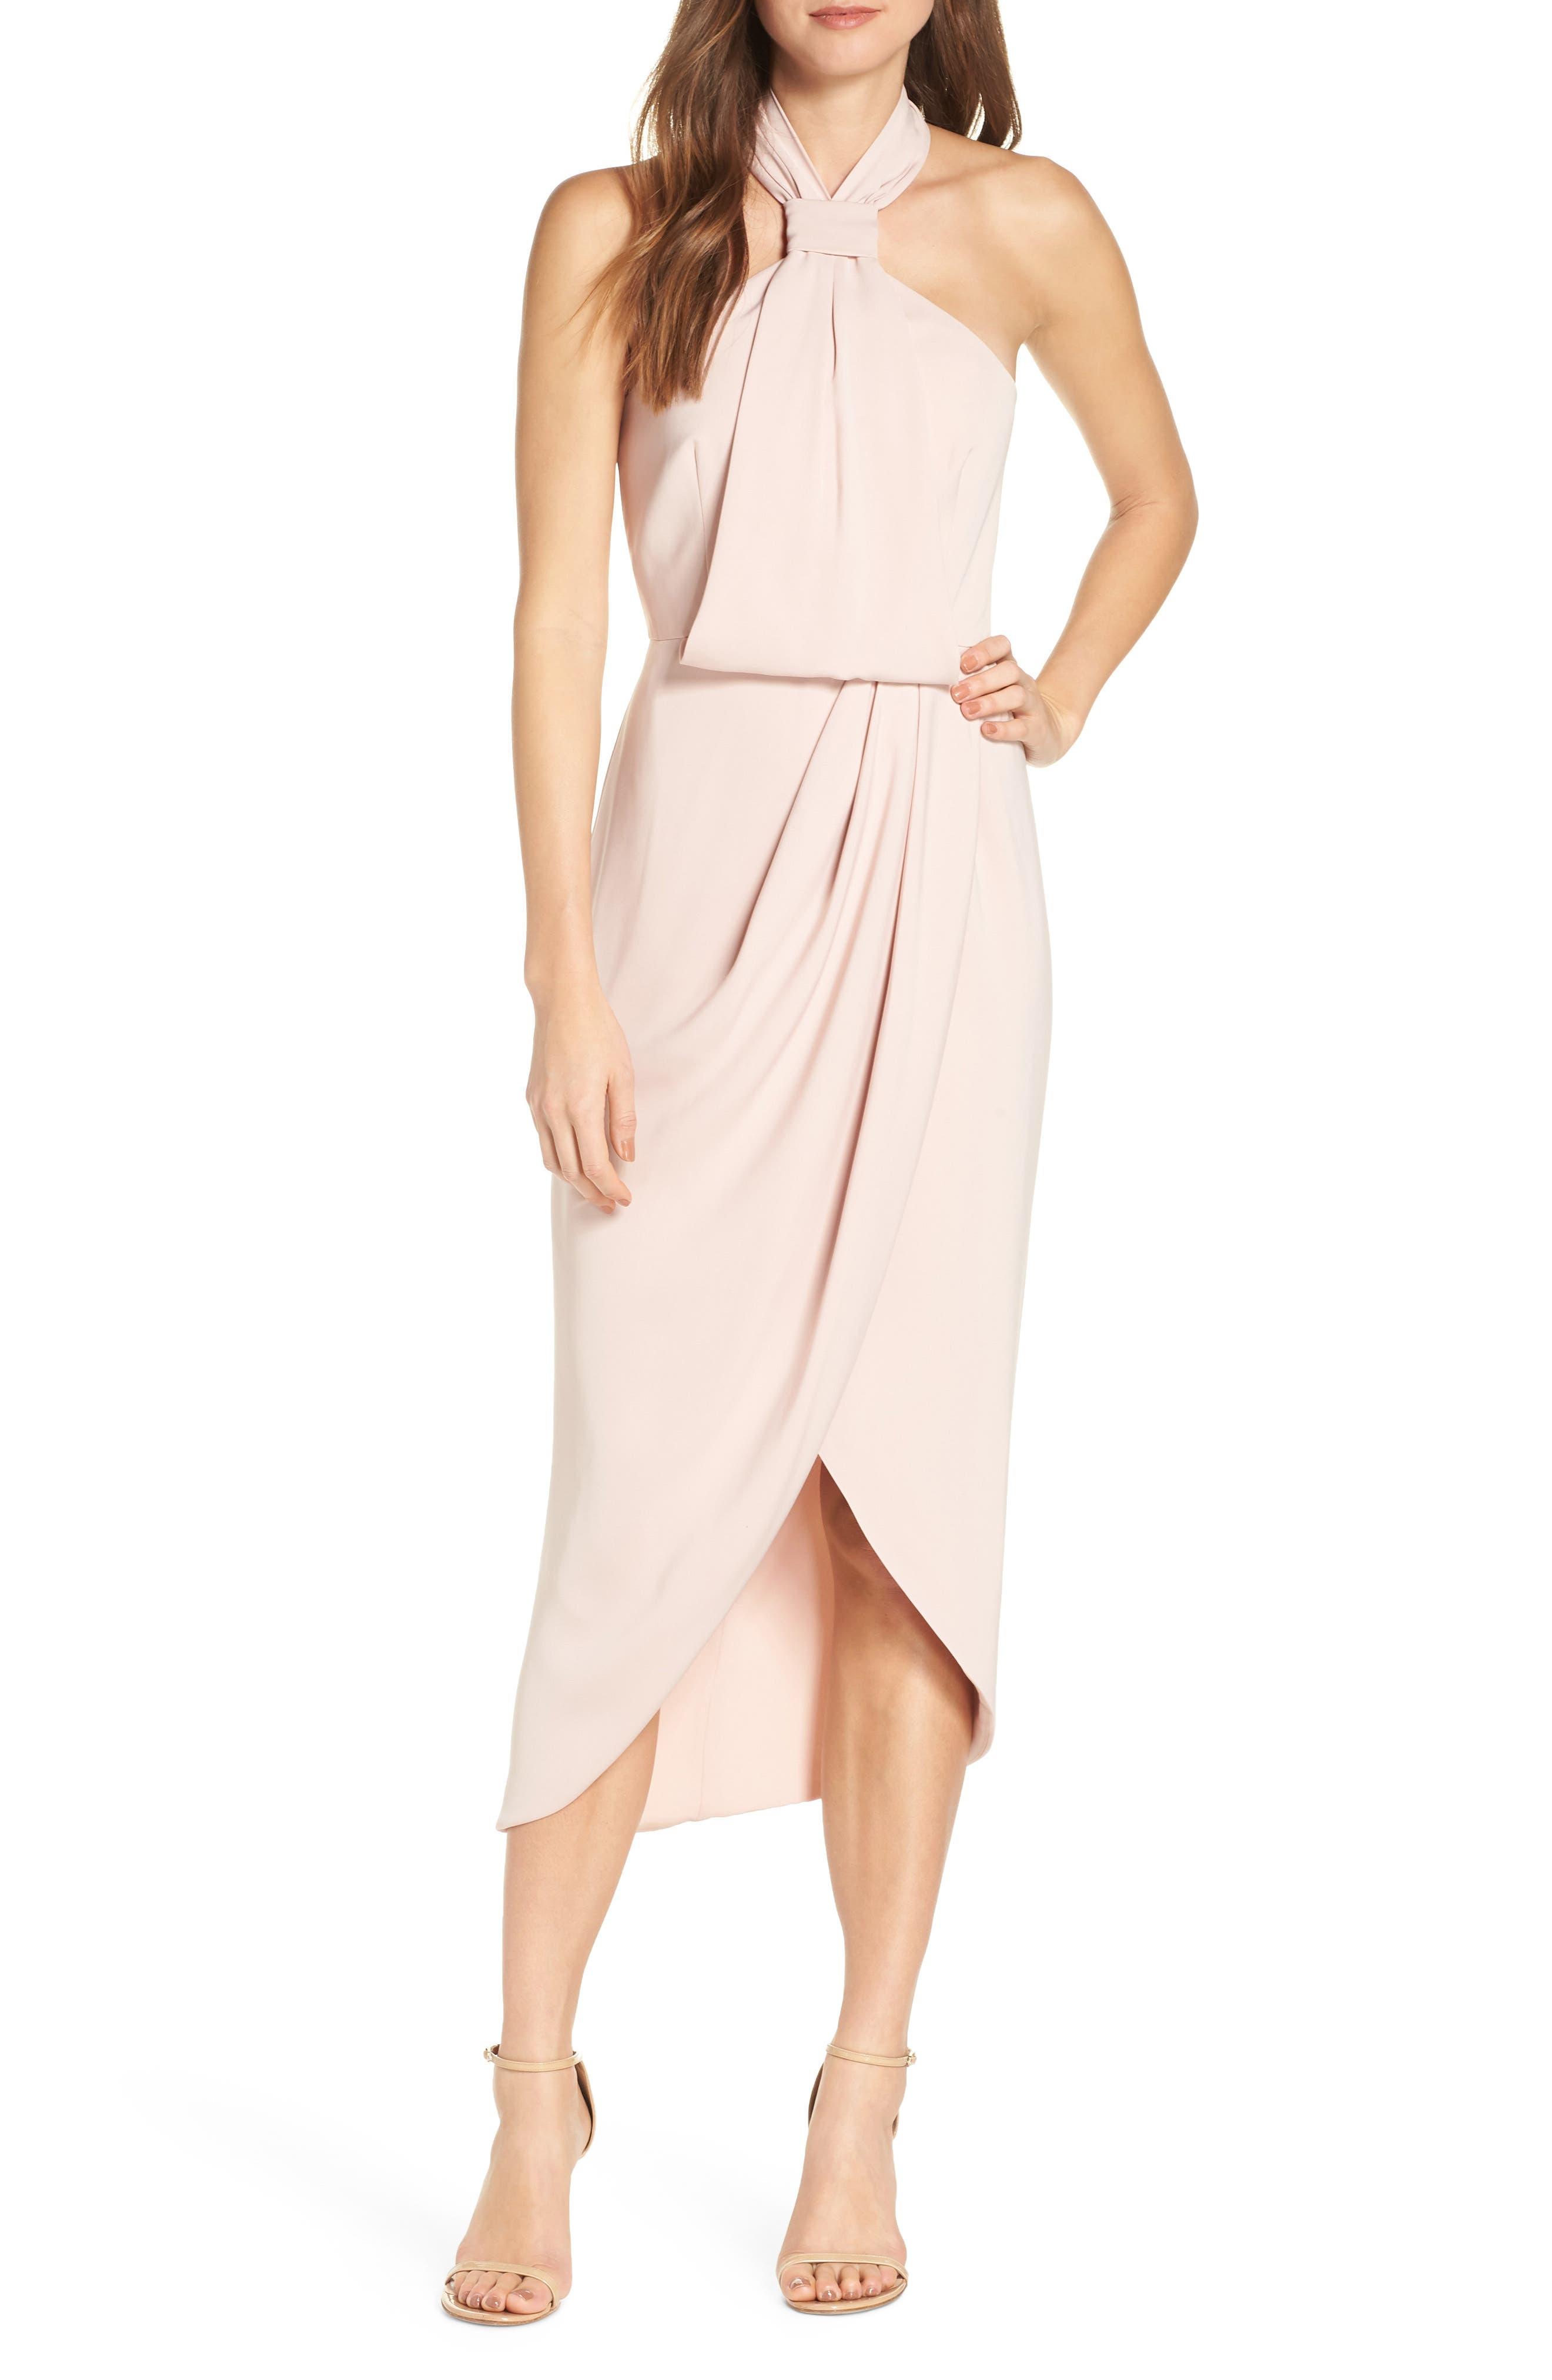 Shona Joy Knotted Tulip Hem Midi Dress, Pink